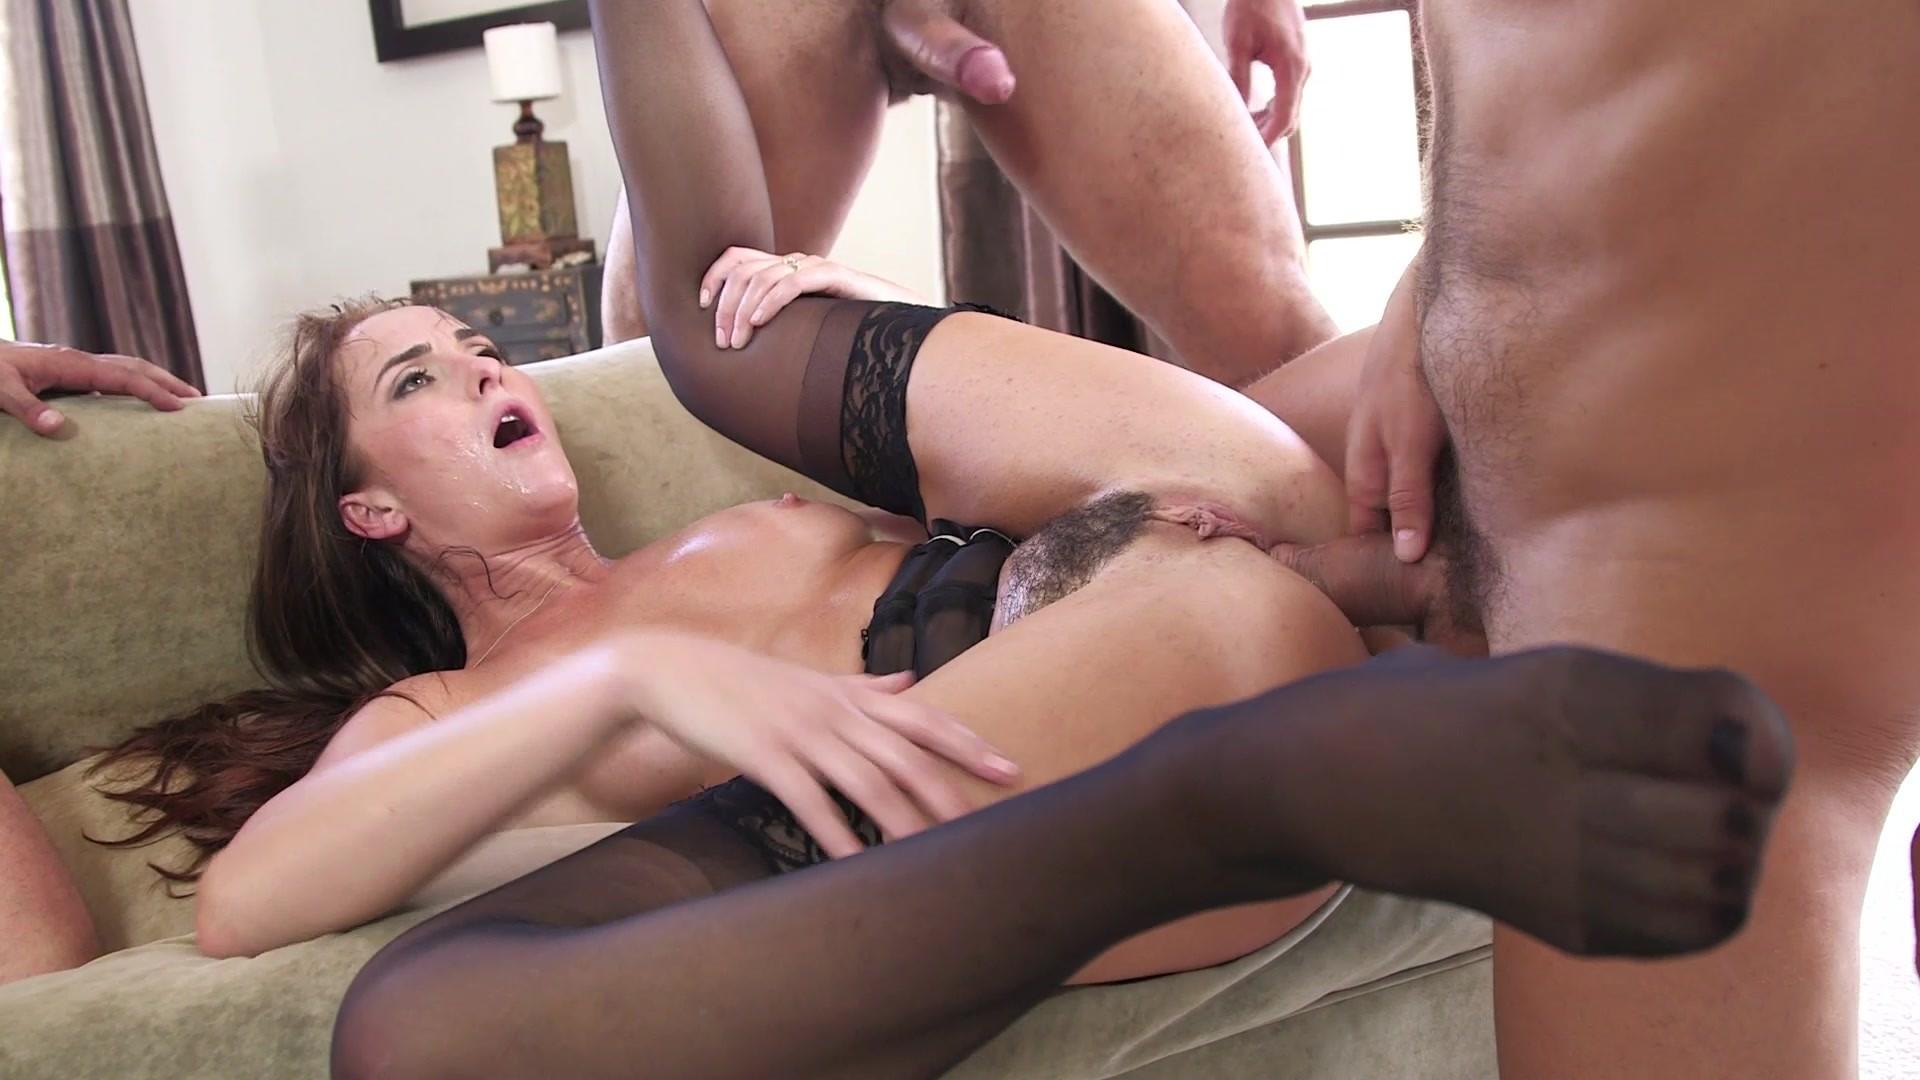 spanked girl screaming porn clips